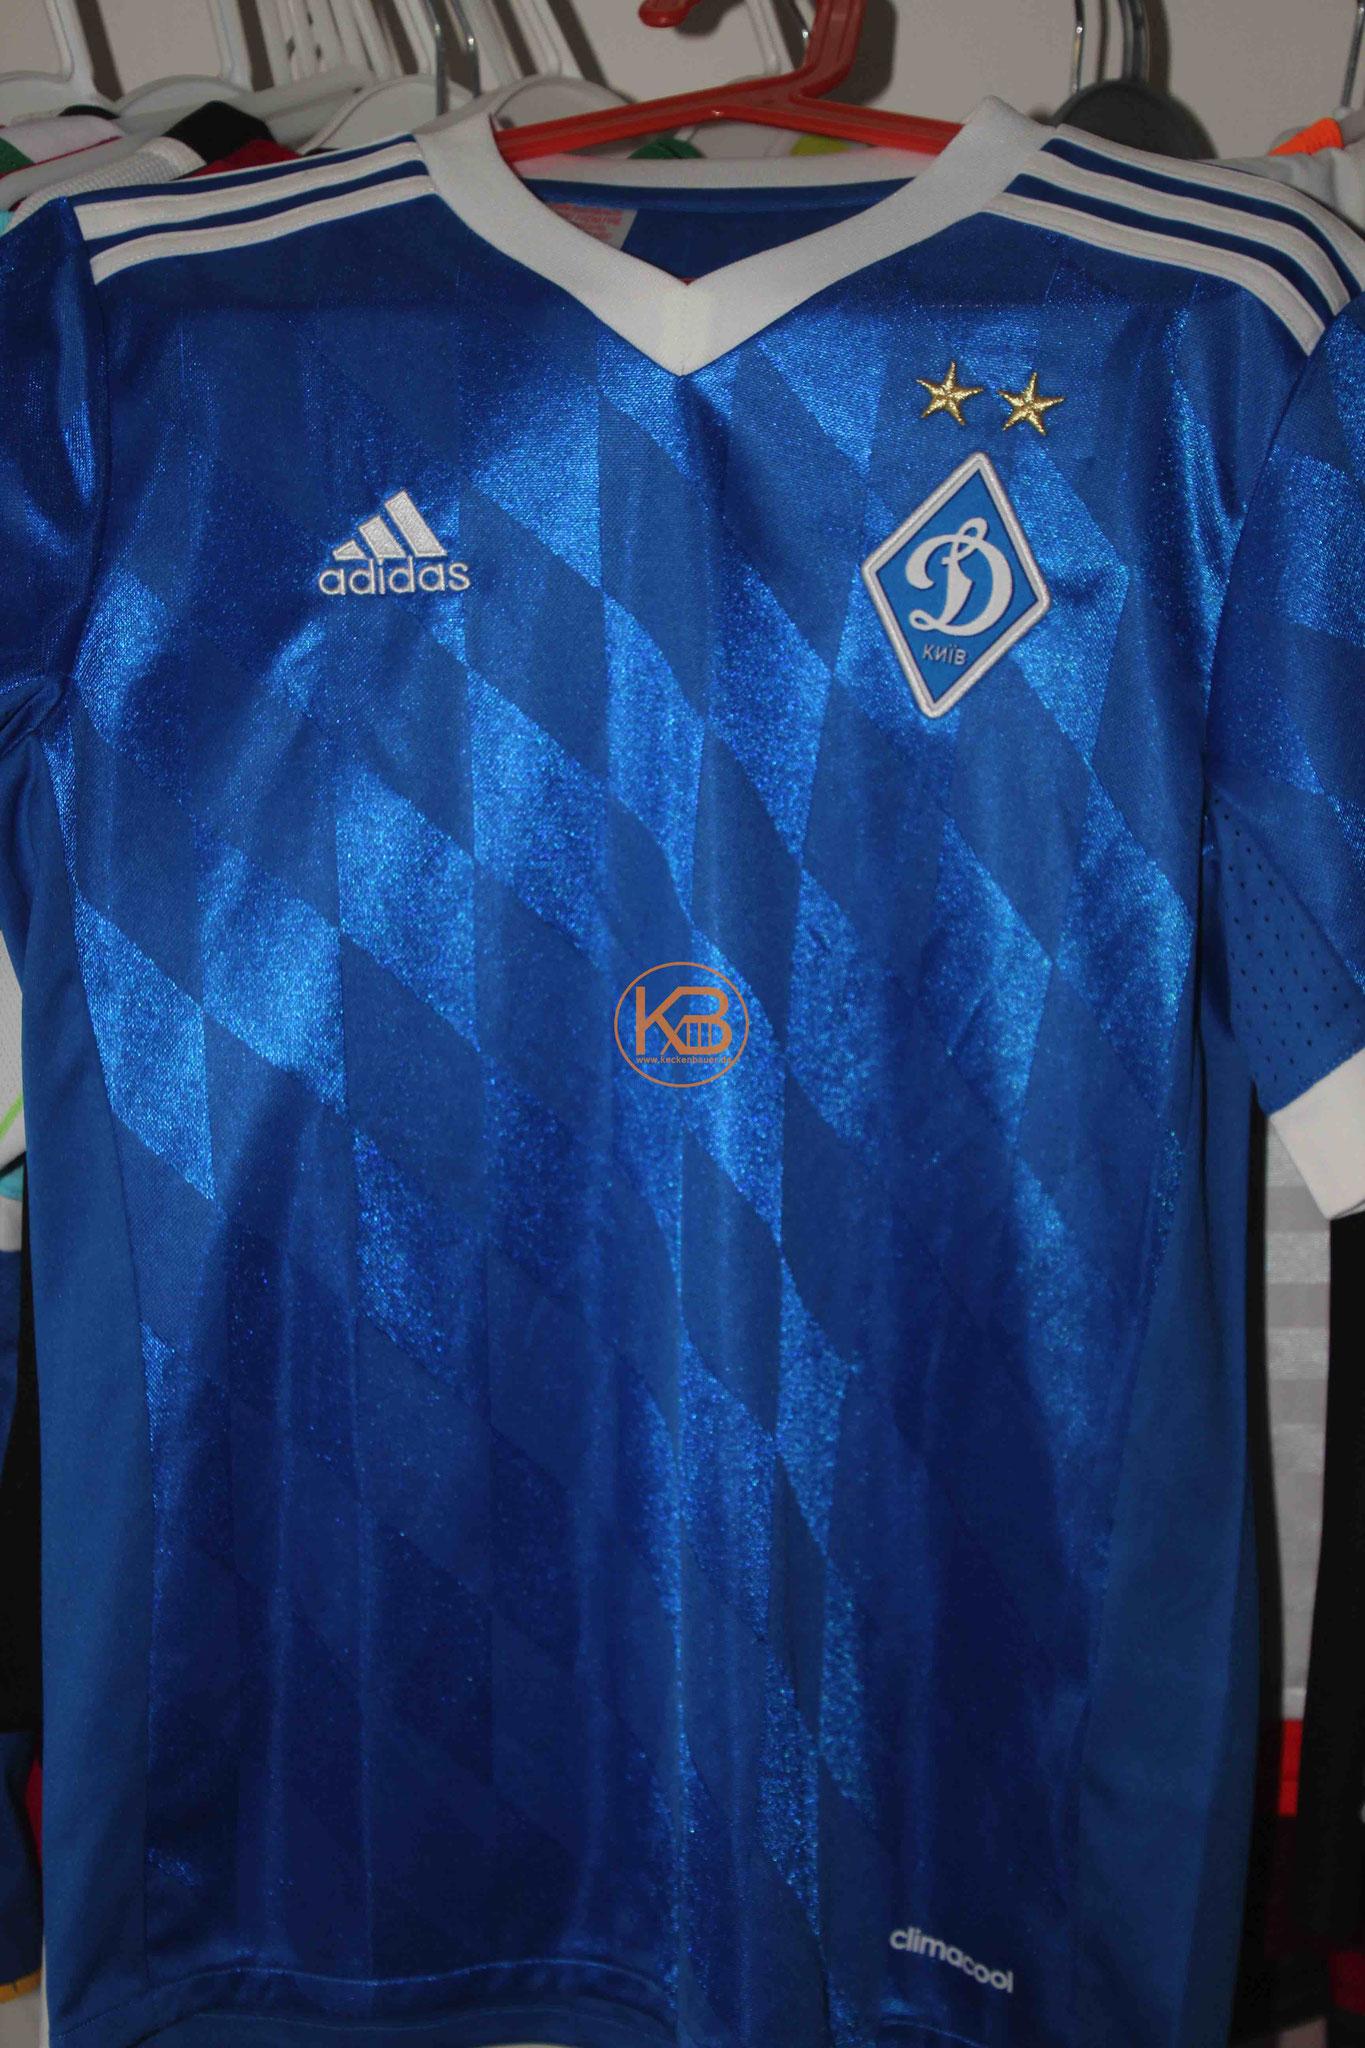 Adidas Trikot von Dynamo Kiew